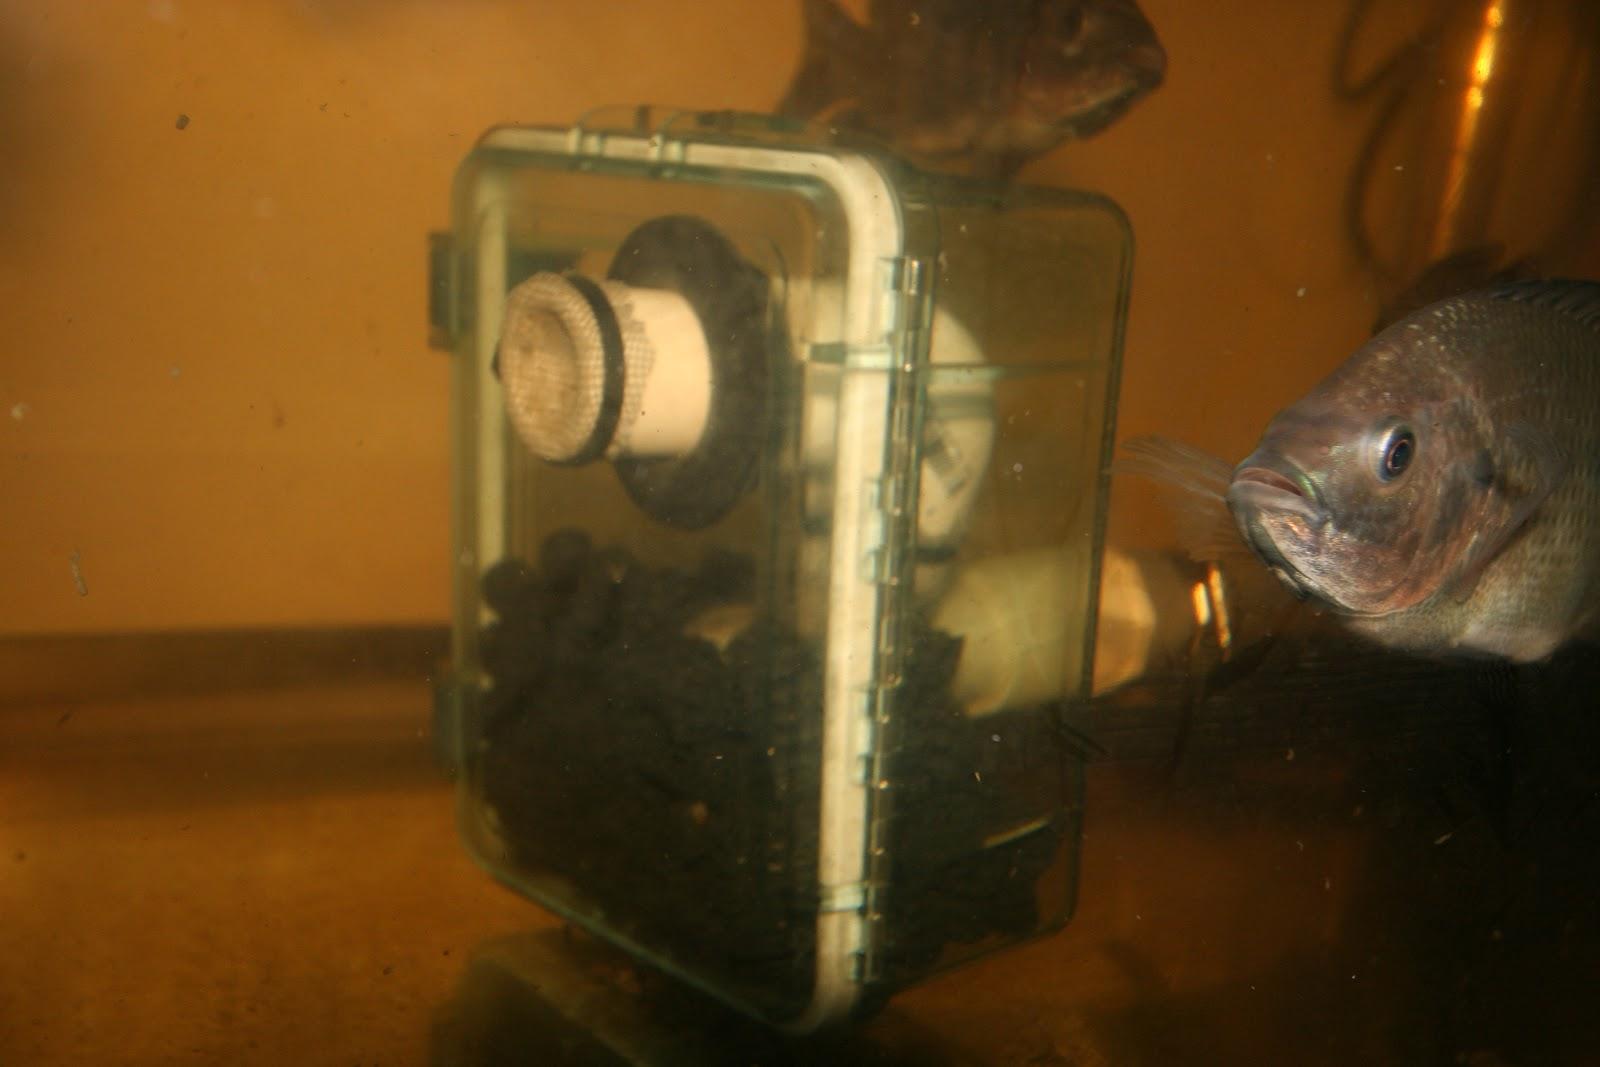 Aquaponic Moving Bed Filter, nitrogen cycle enricher